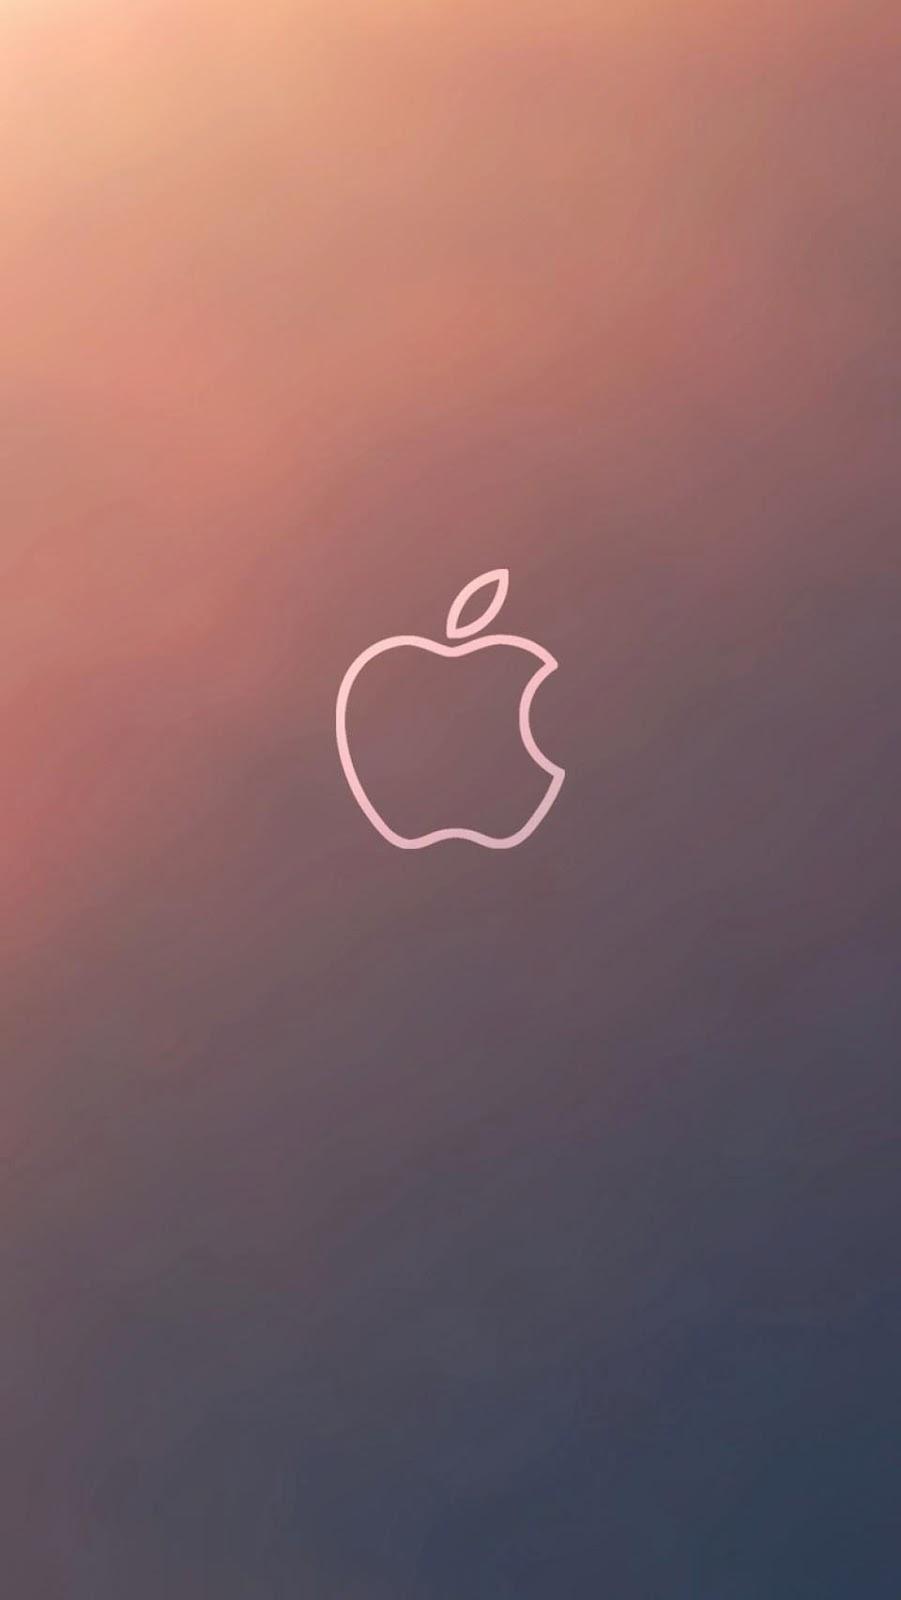 IPhone 6 Plus Wallpaper Apple Logo Covers Heat 901x1600